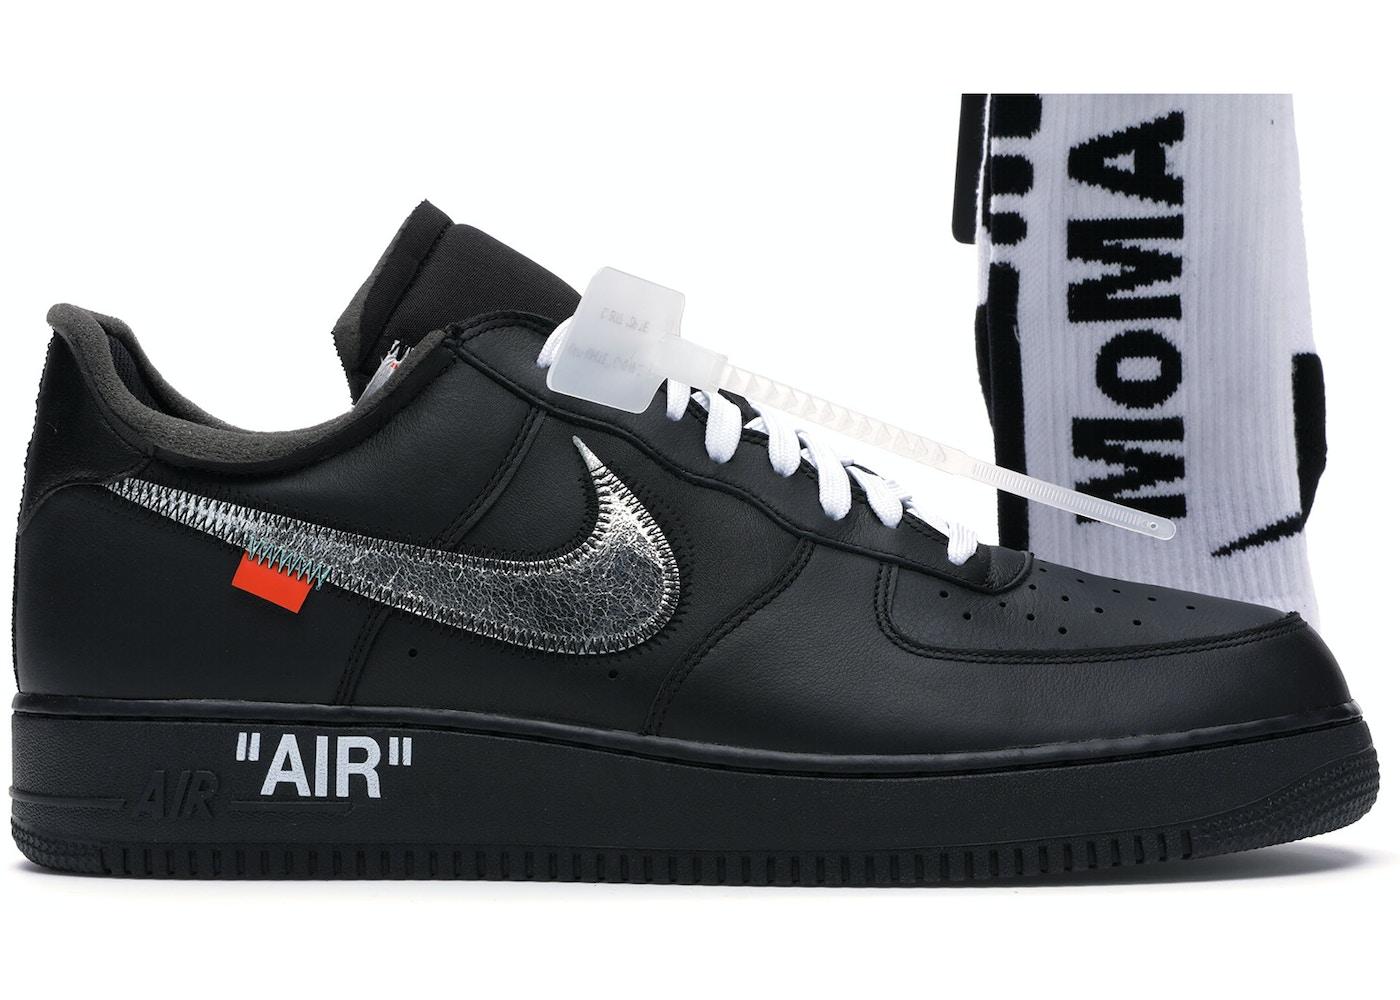 período Cerdo Inseguro  Nike Air Force 1 '07 Virgil x MoMA (With Socks) - AV5210-001